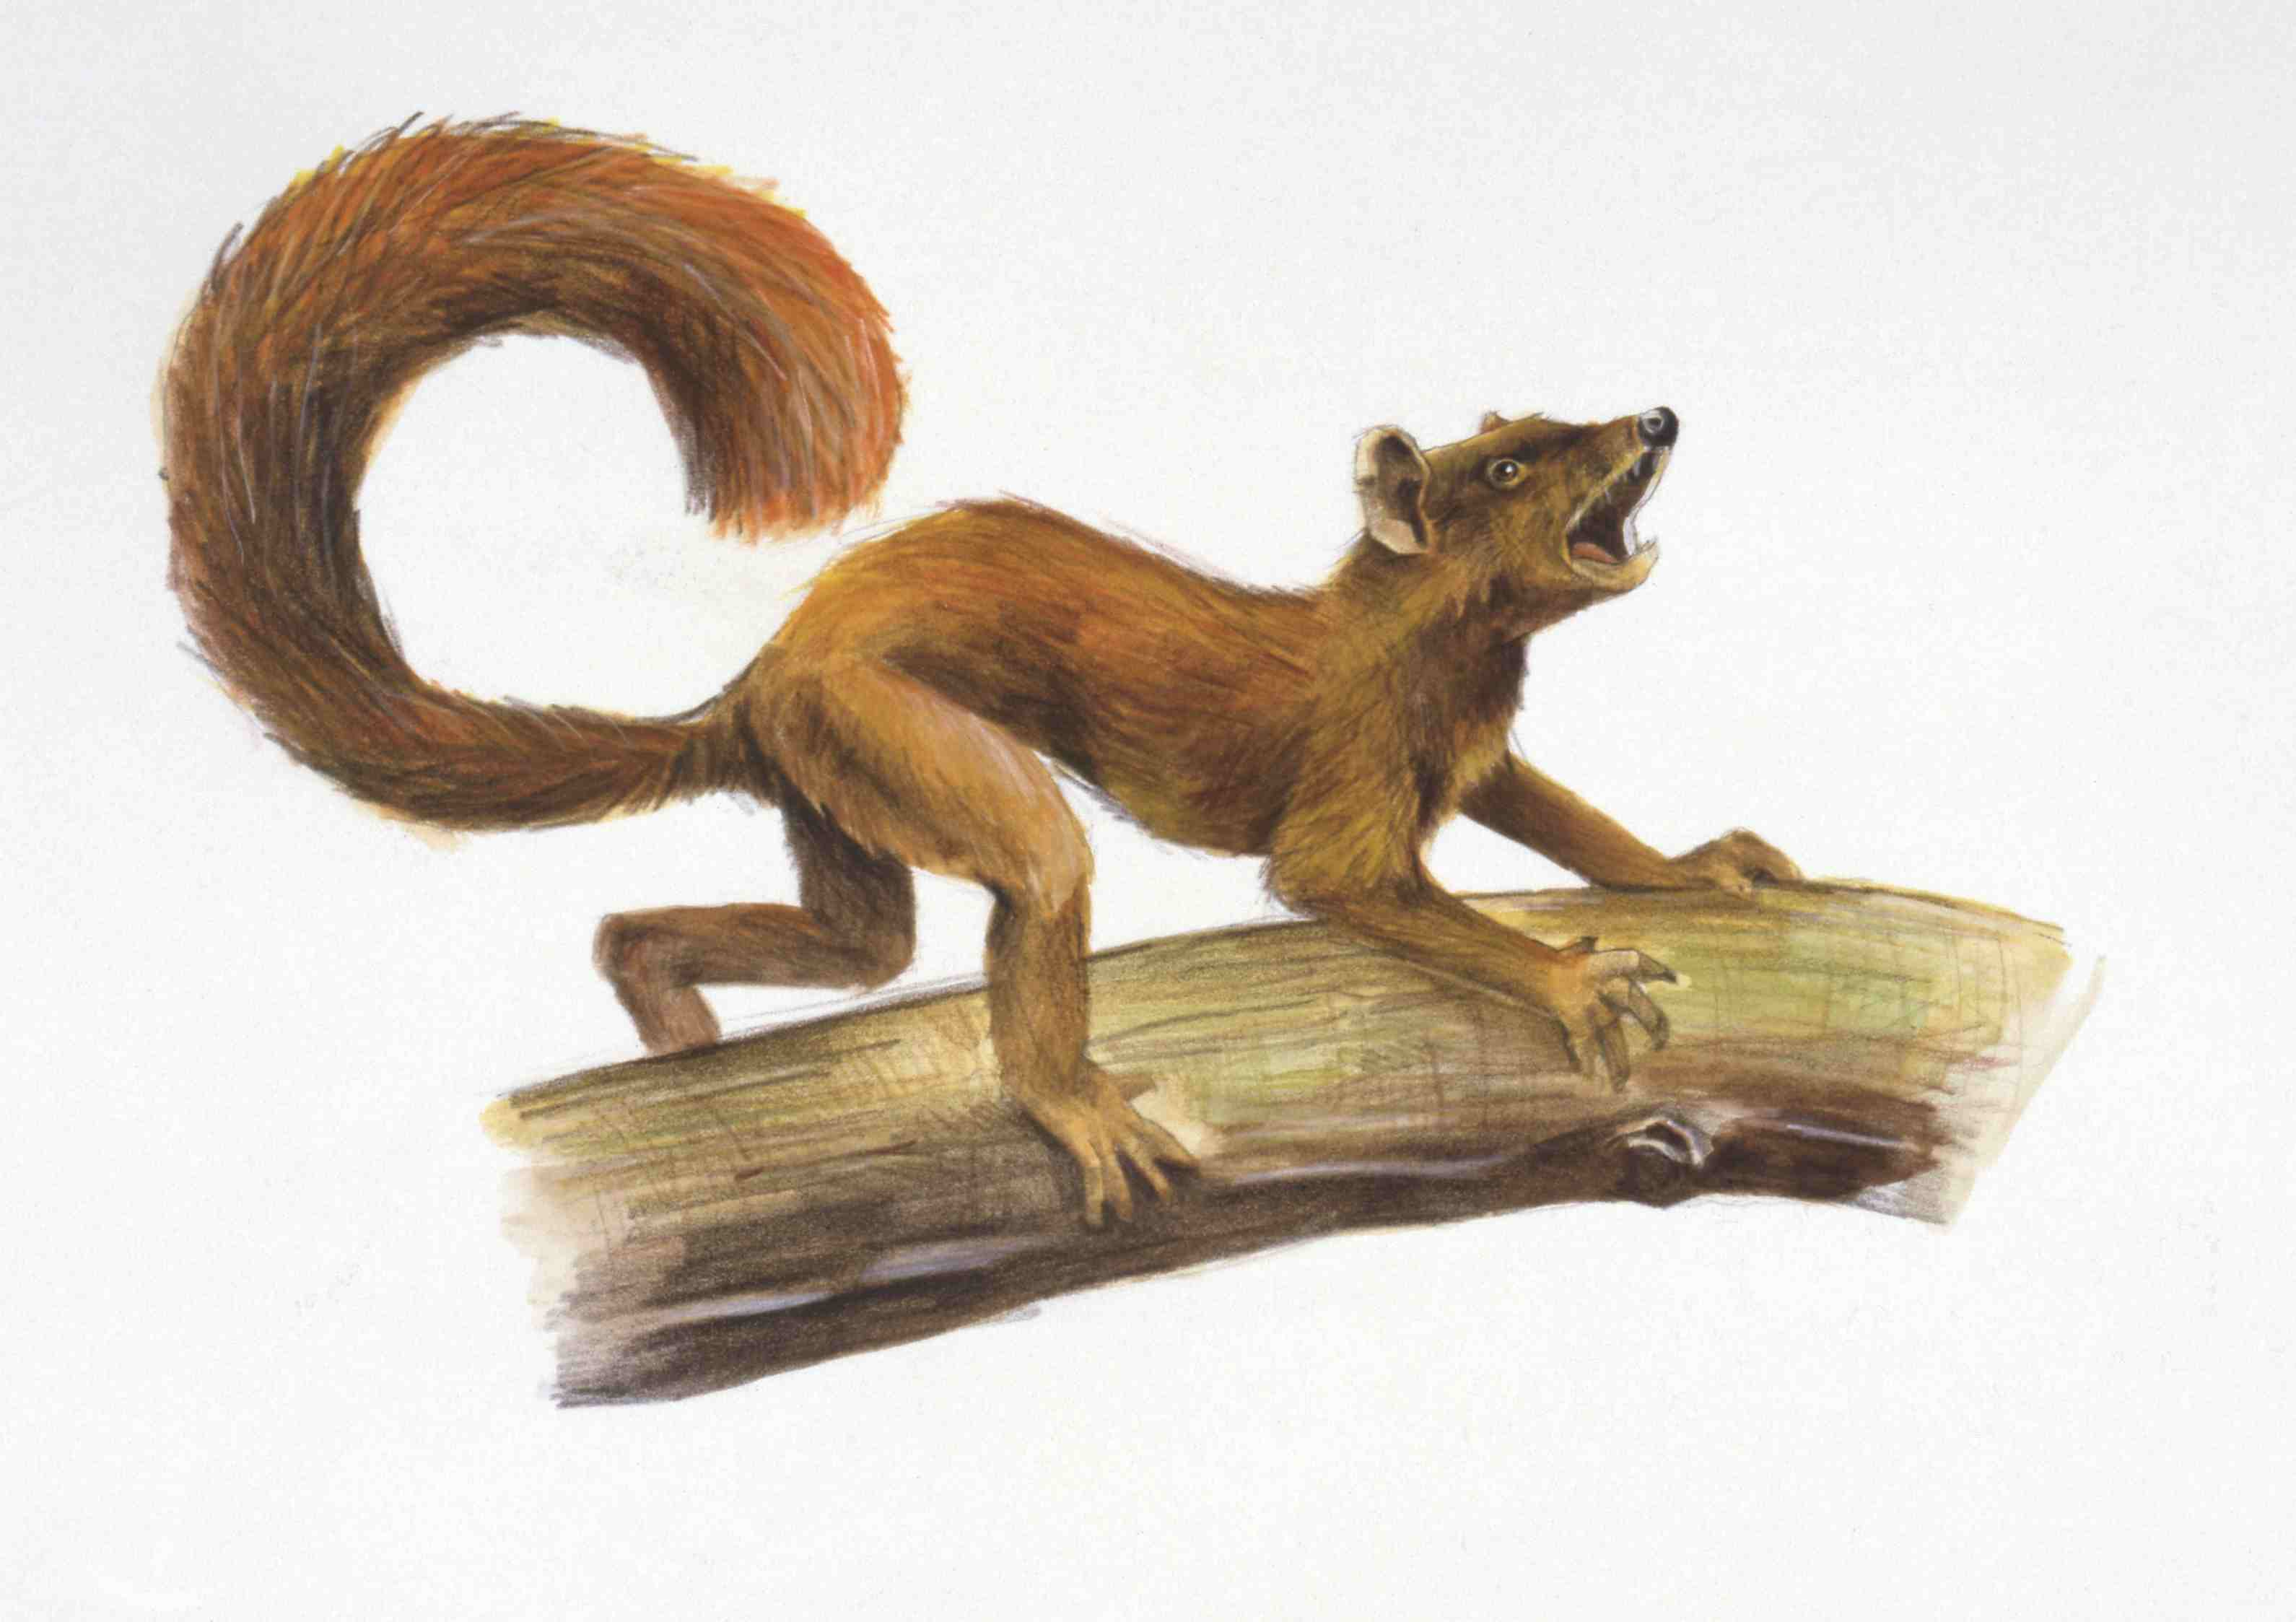 An artist's rendering of plesiadapis